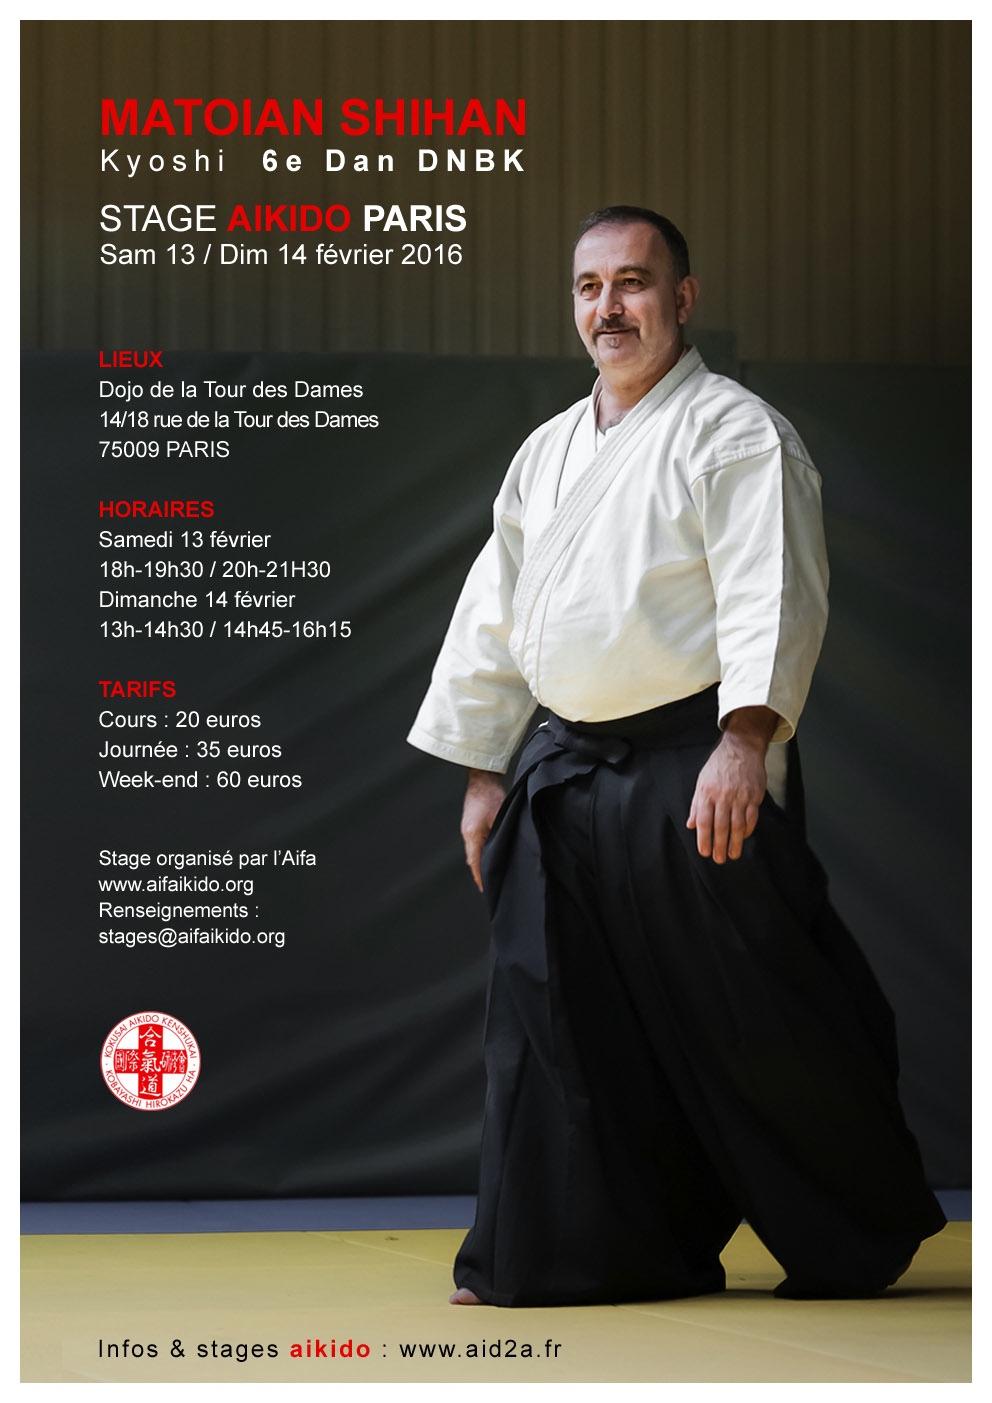 club aikido paris 9